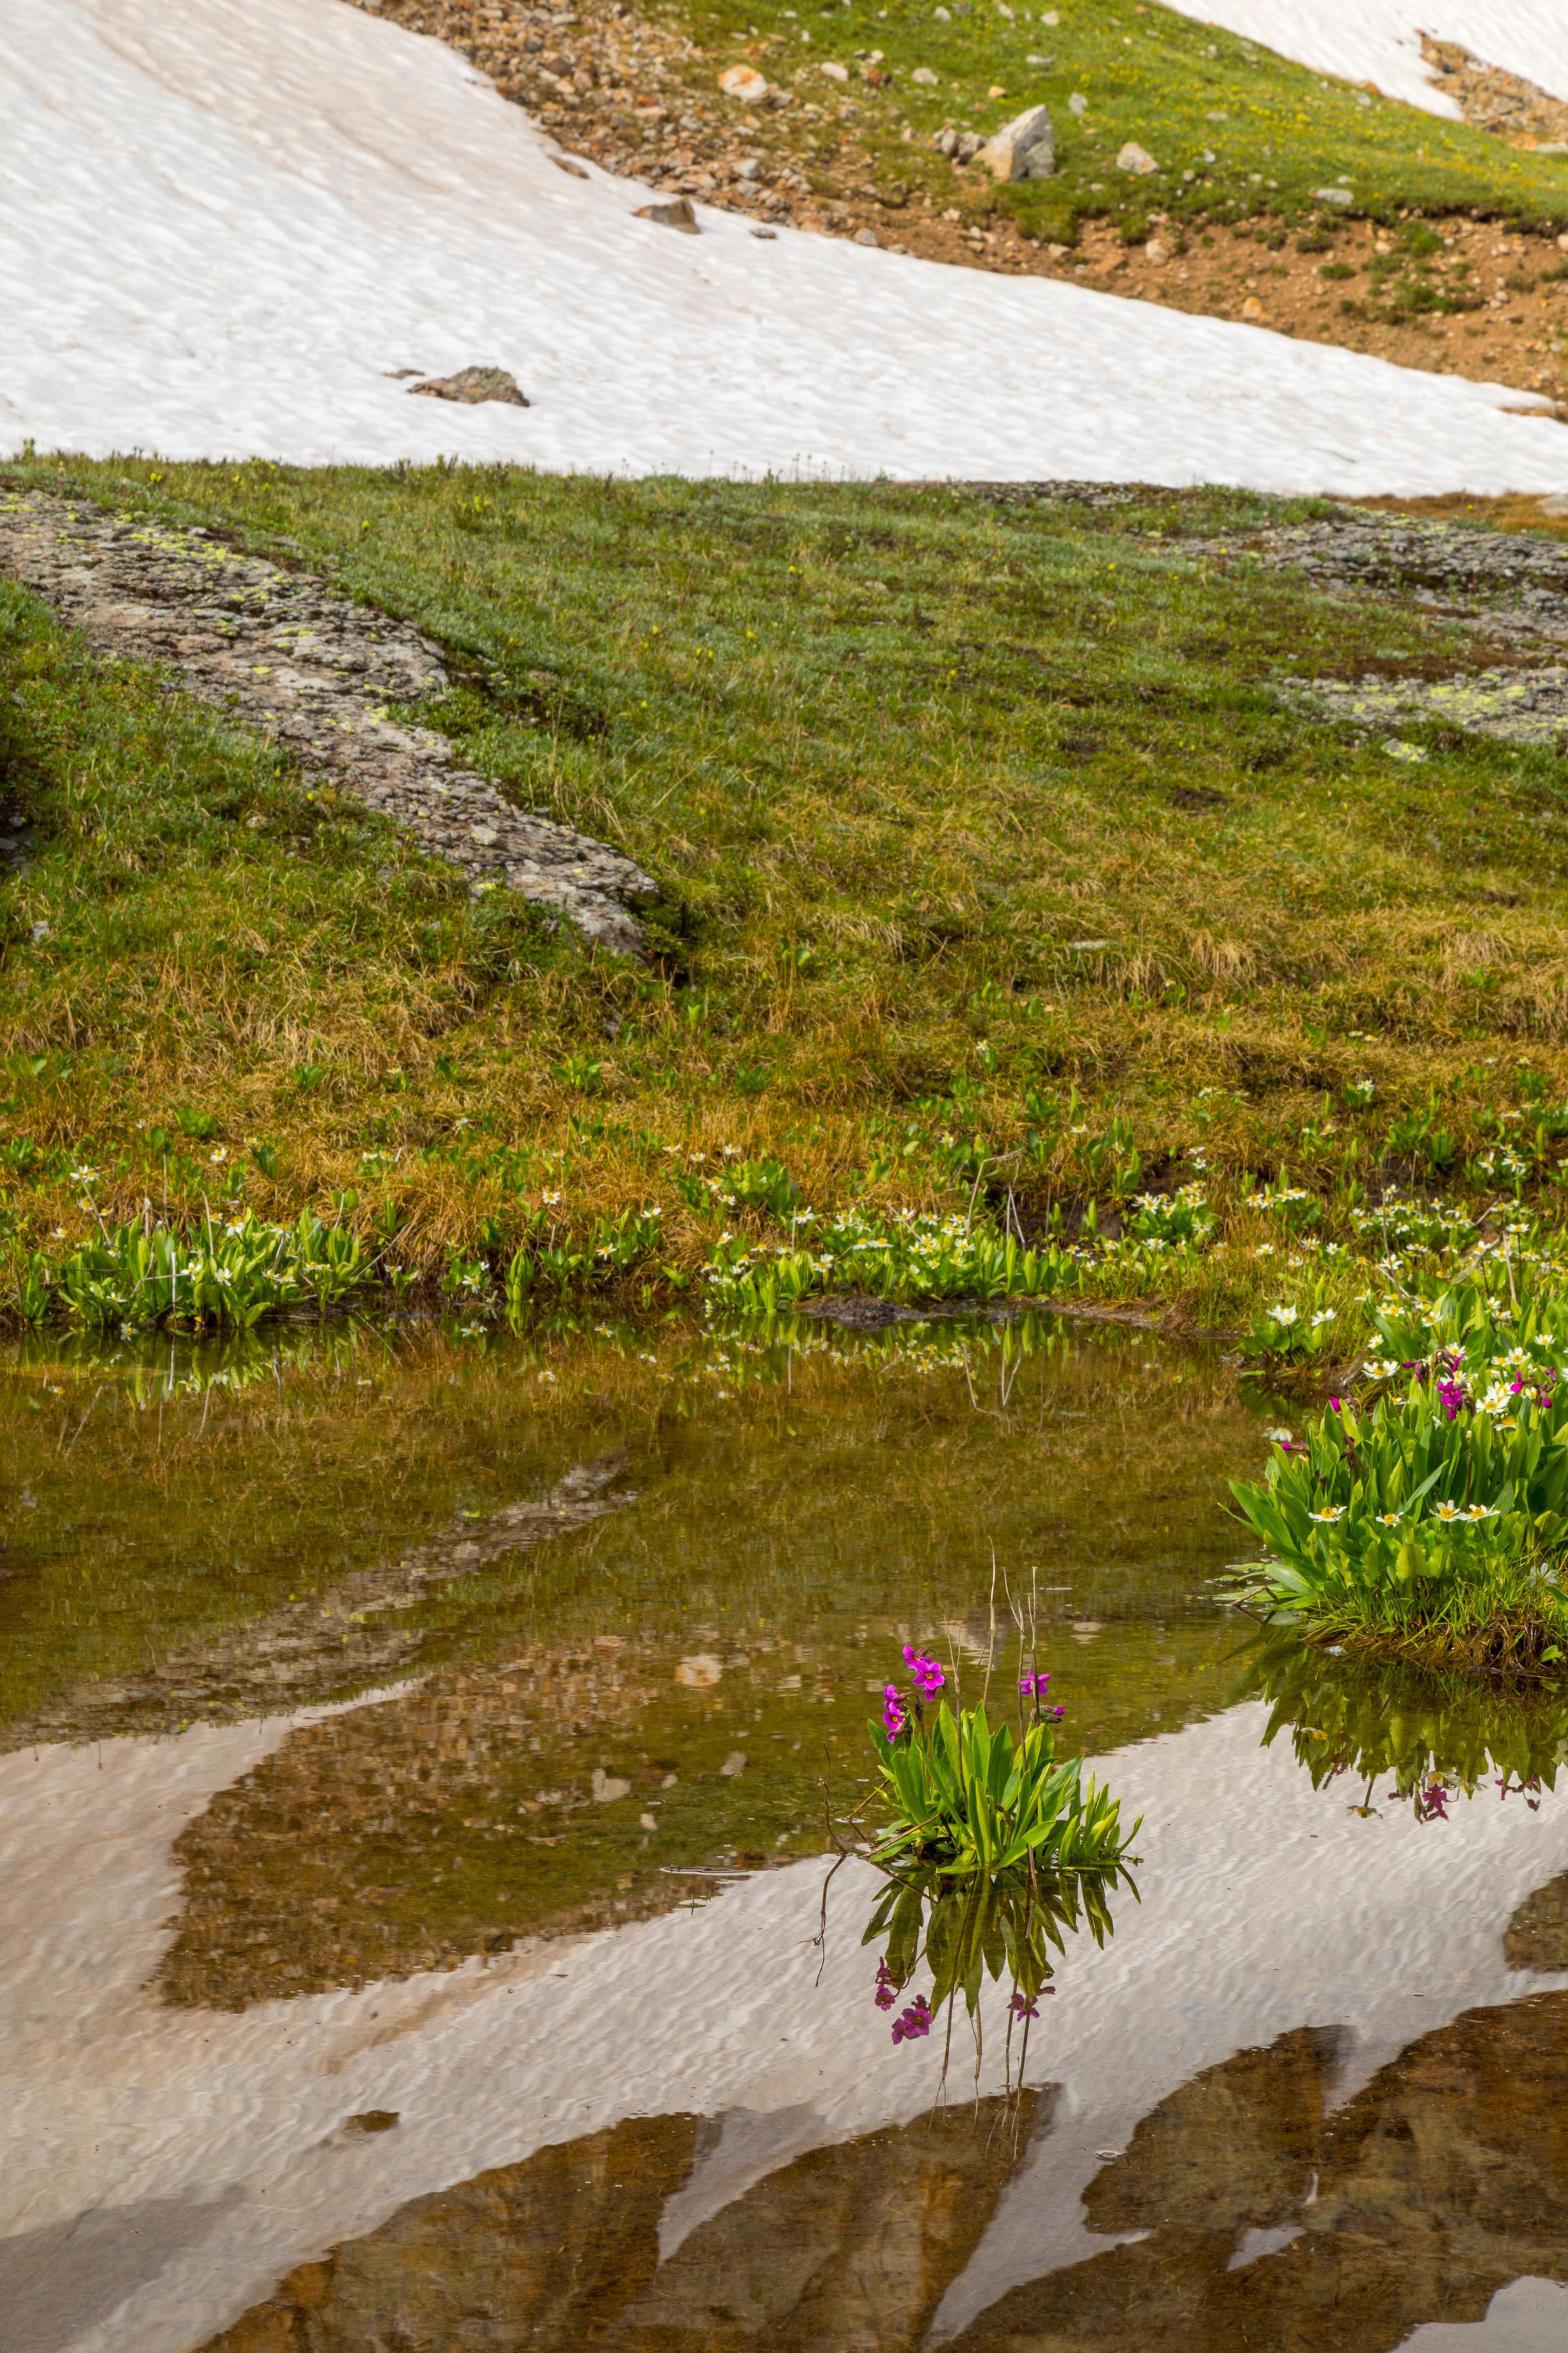 Porphyry Basin, Image # 240